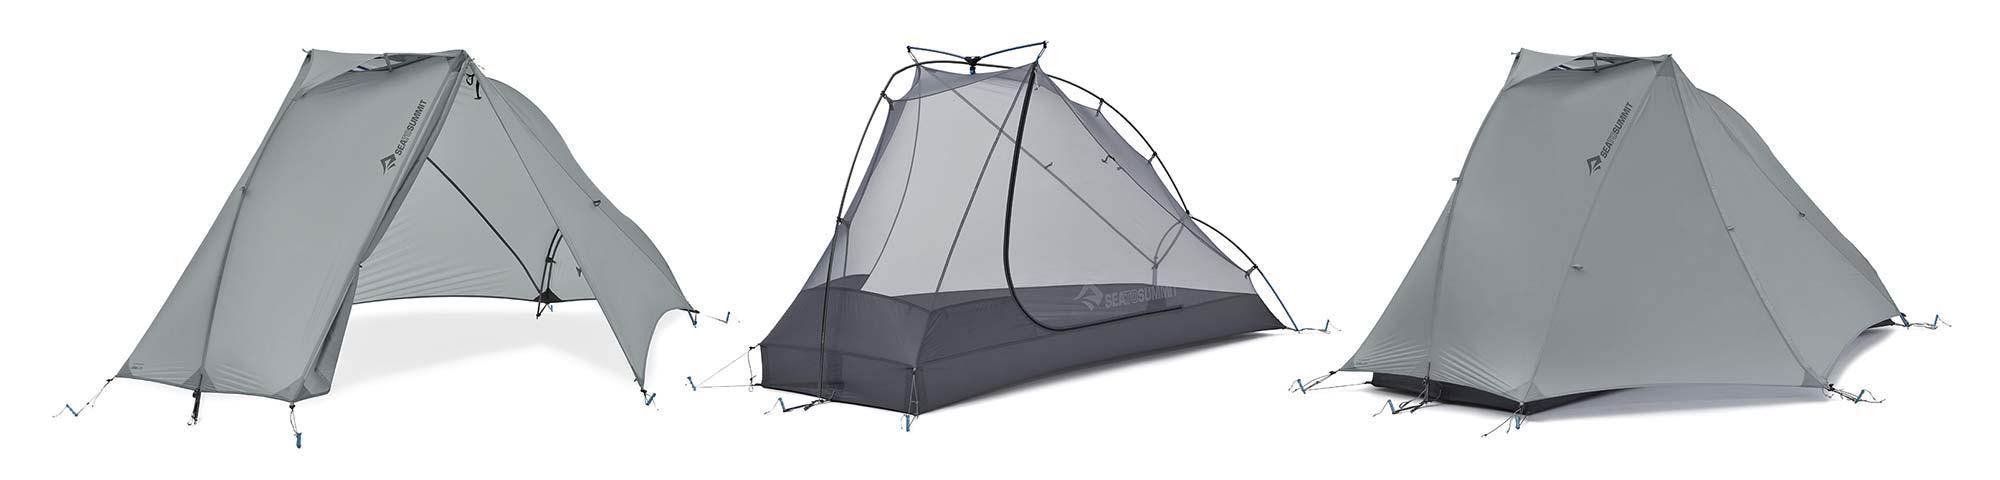 Sea to Summit Alto and Telos TR lightweight tents, Tension Ridge modular 3-season ultralight bikepacking tent,setup options